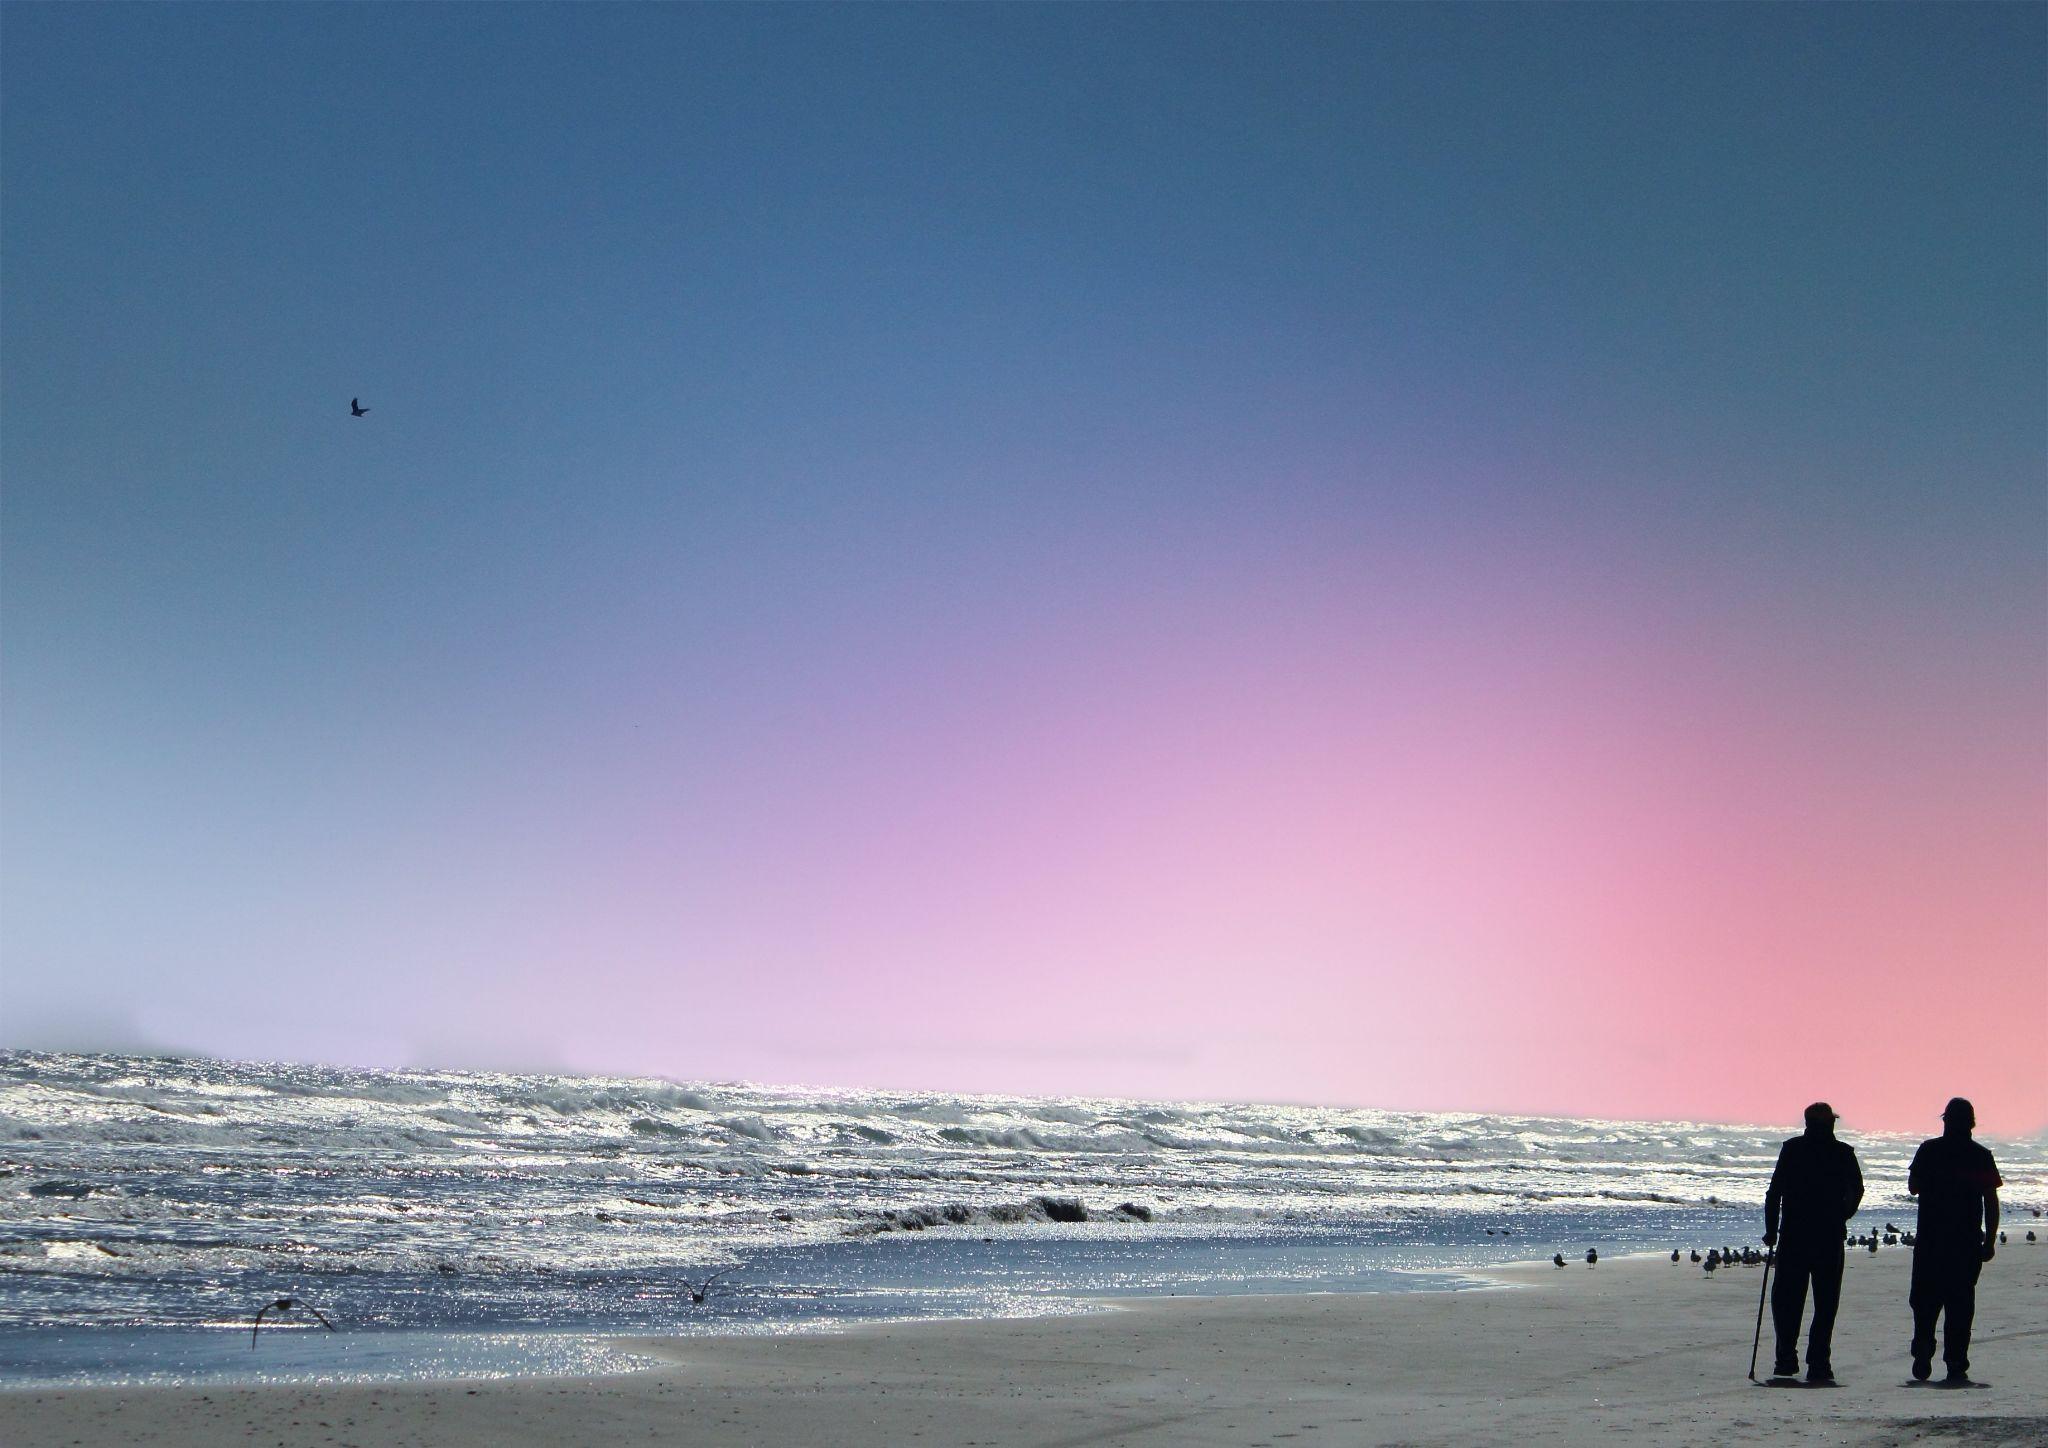 Calm day at the beach by Jackeline Ramirez